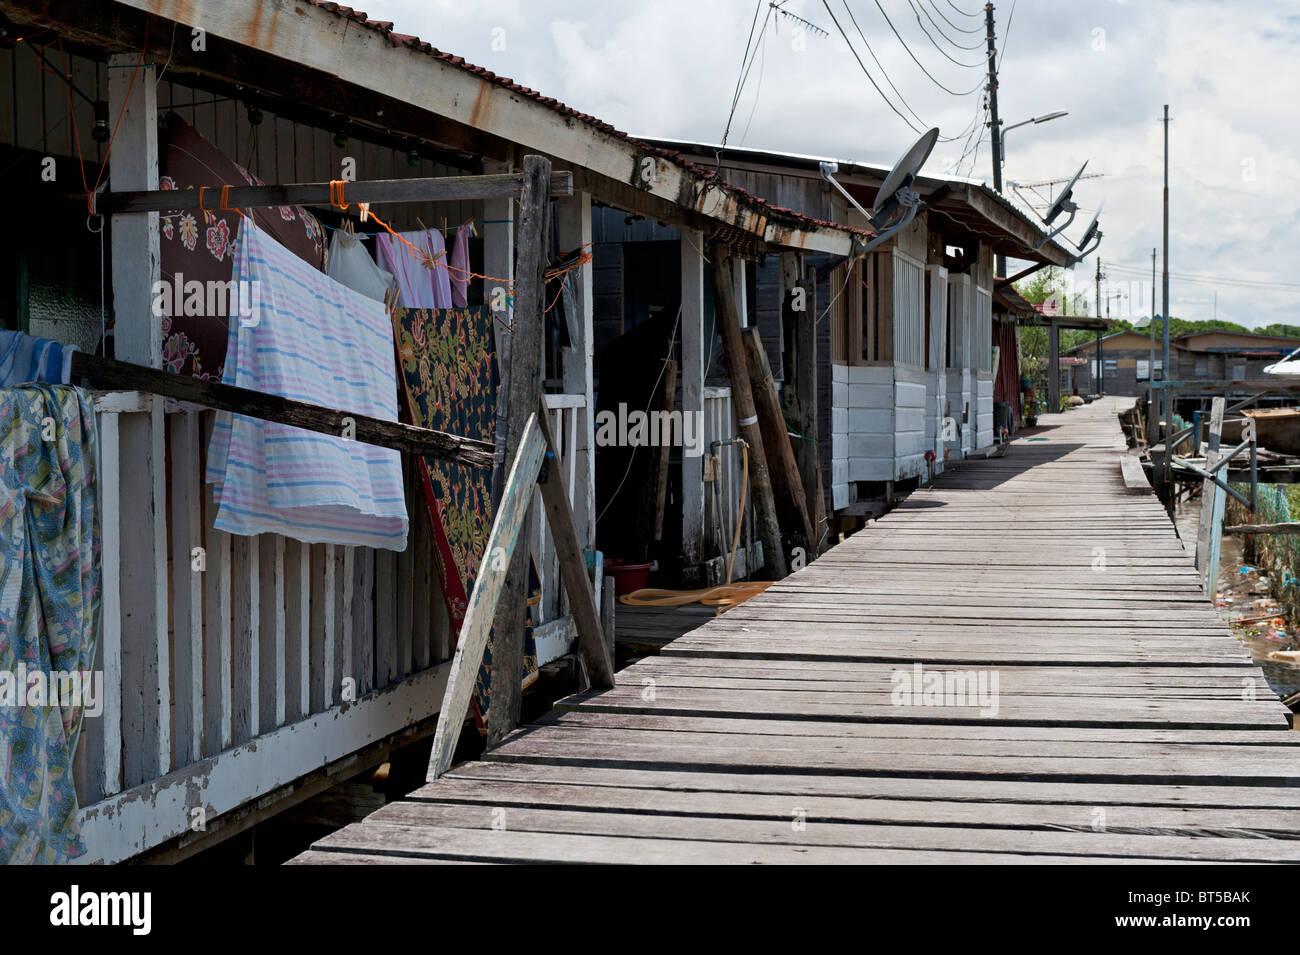 Typical Wooden Stilt Houses in Kampong Ayer Water Village in Bandar Seri Begawan, Brunei - Stock Image